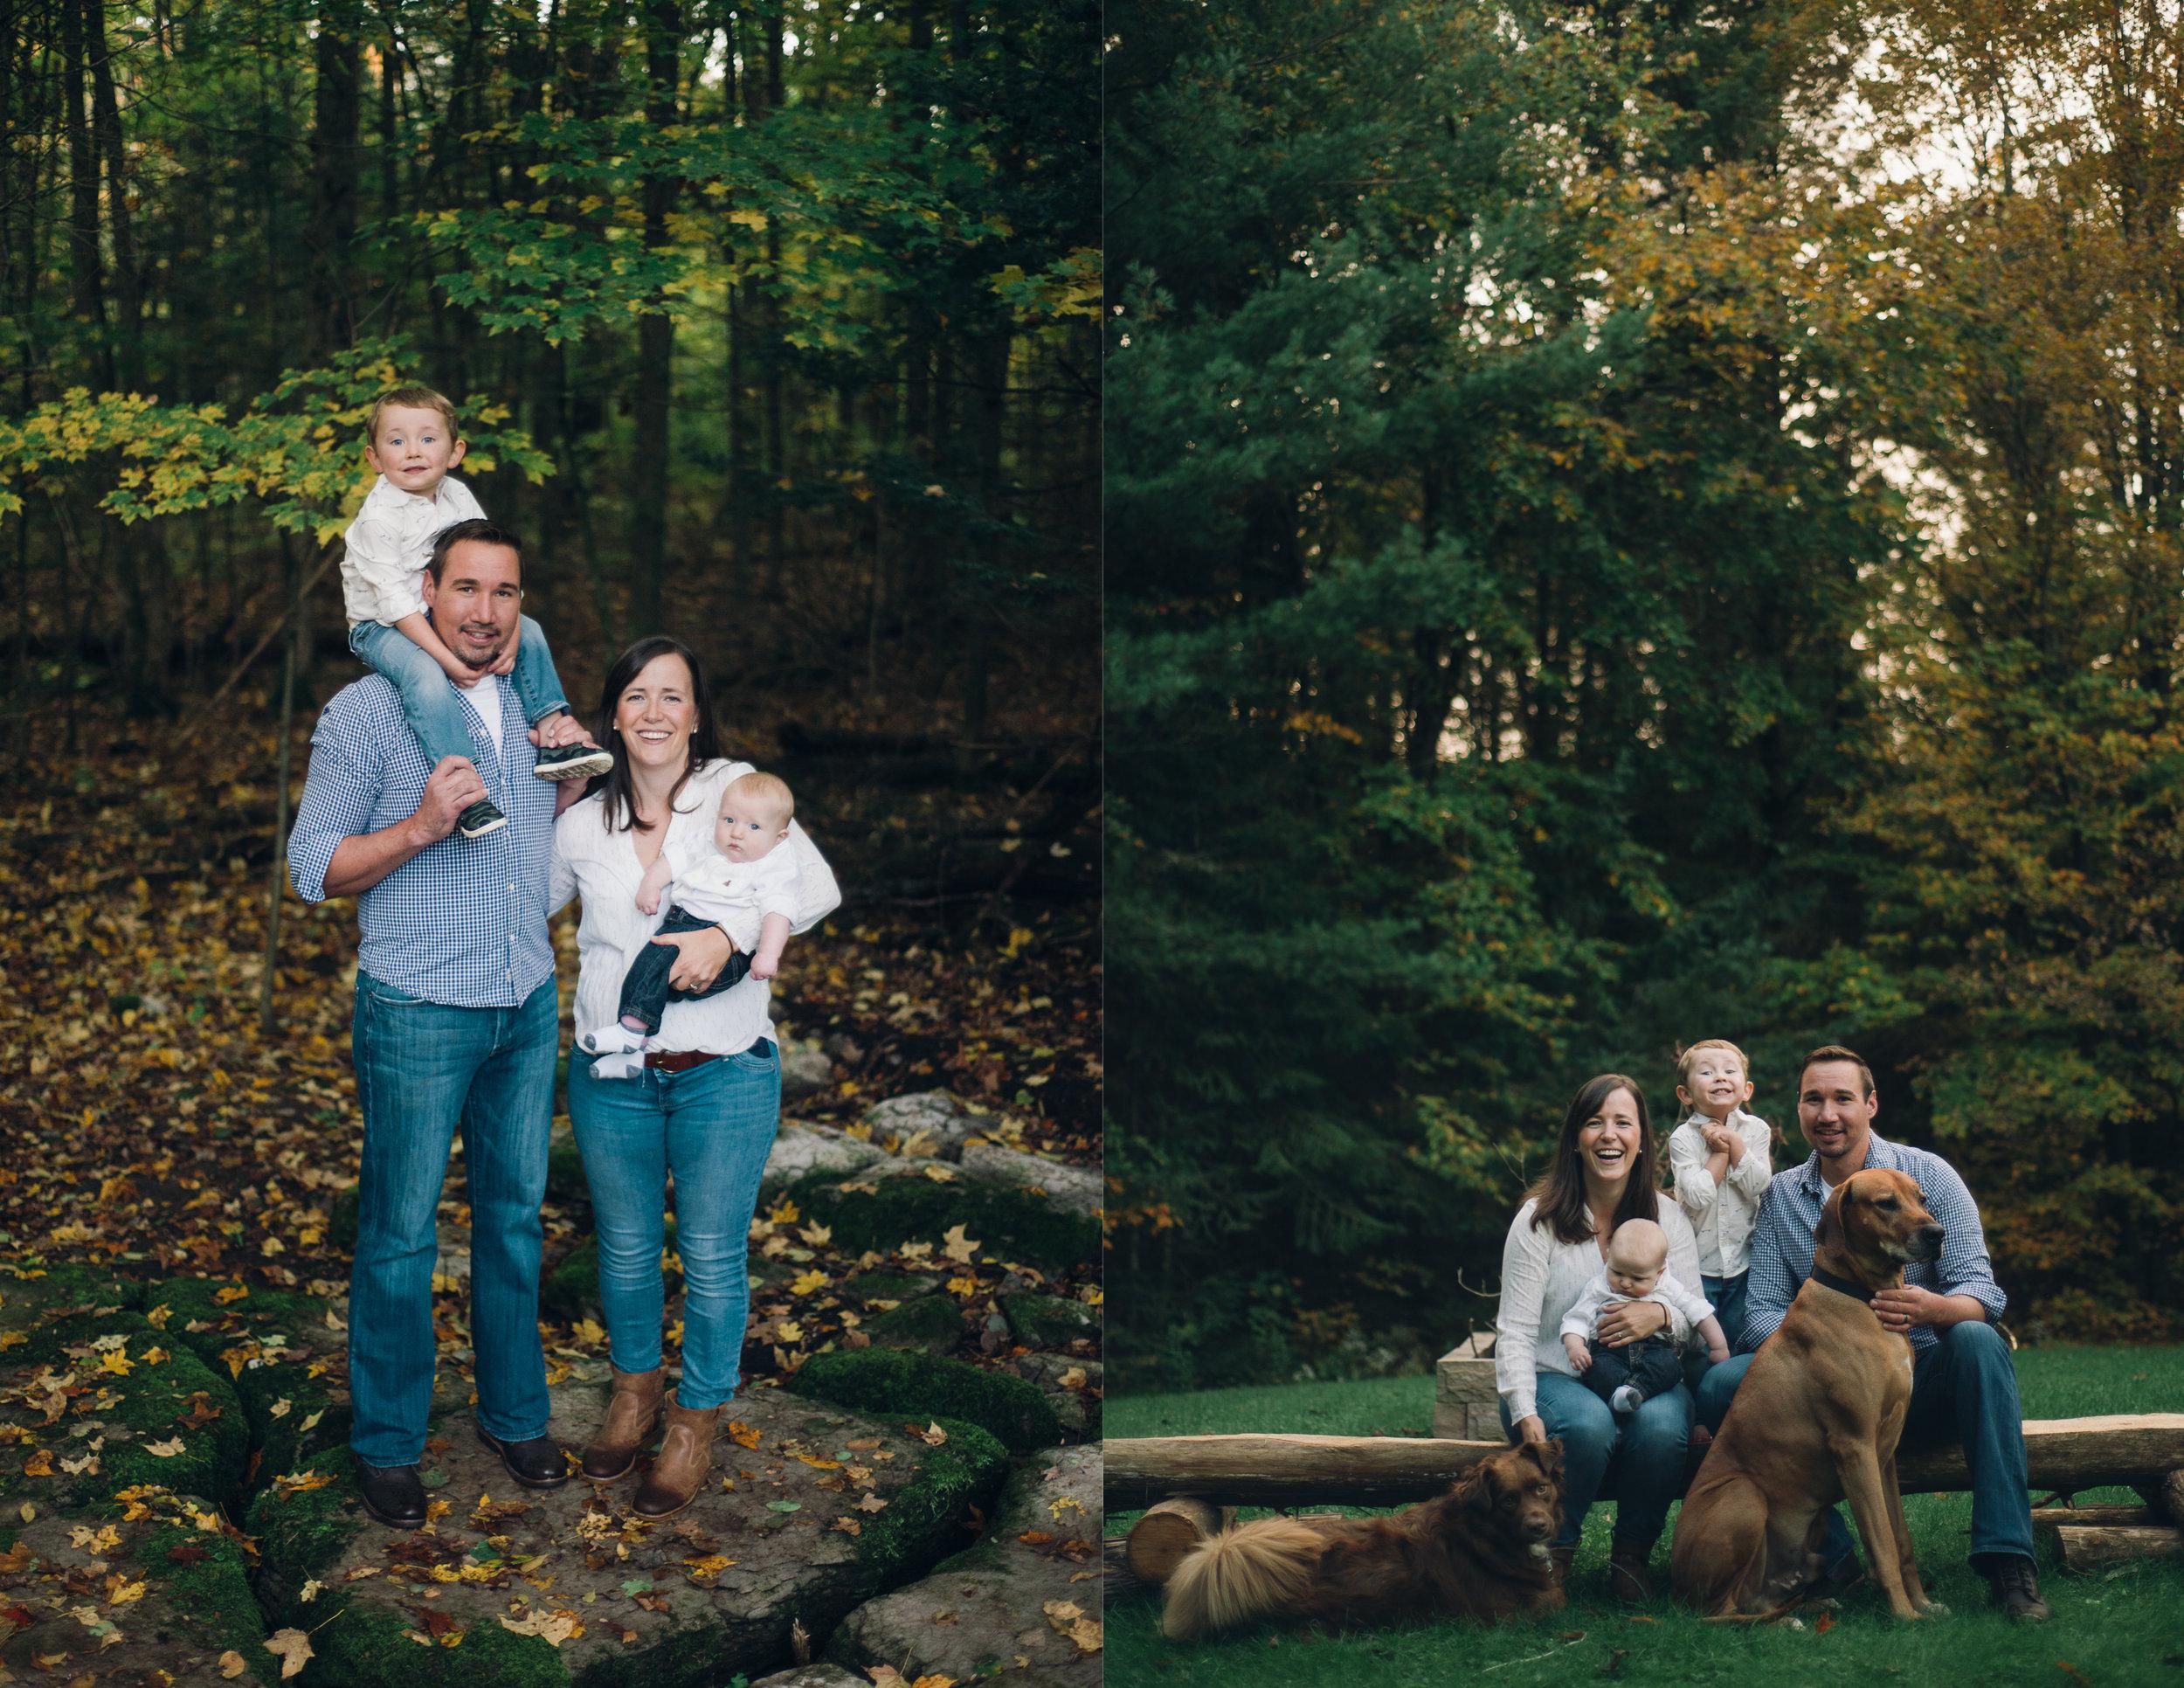 Harrowsmith Backyard Family _2x2_4.jpg